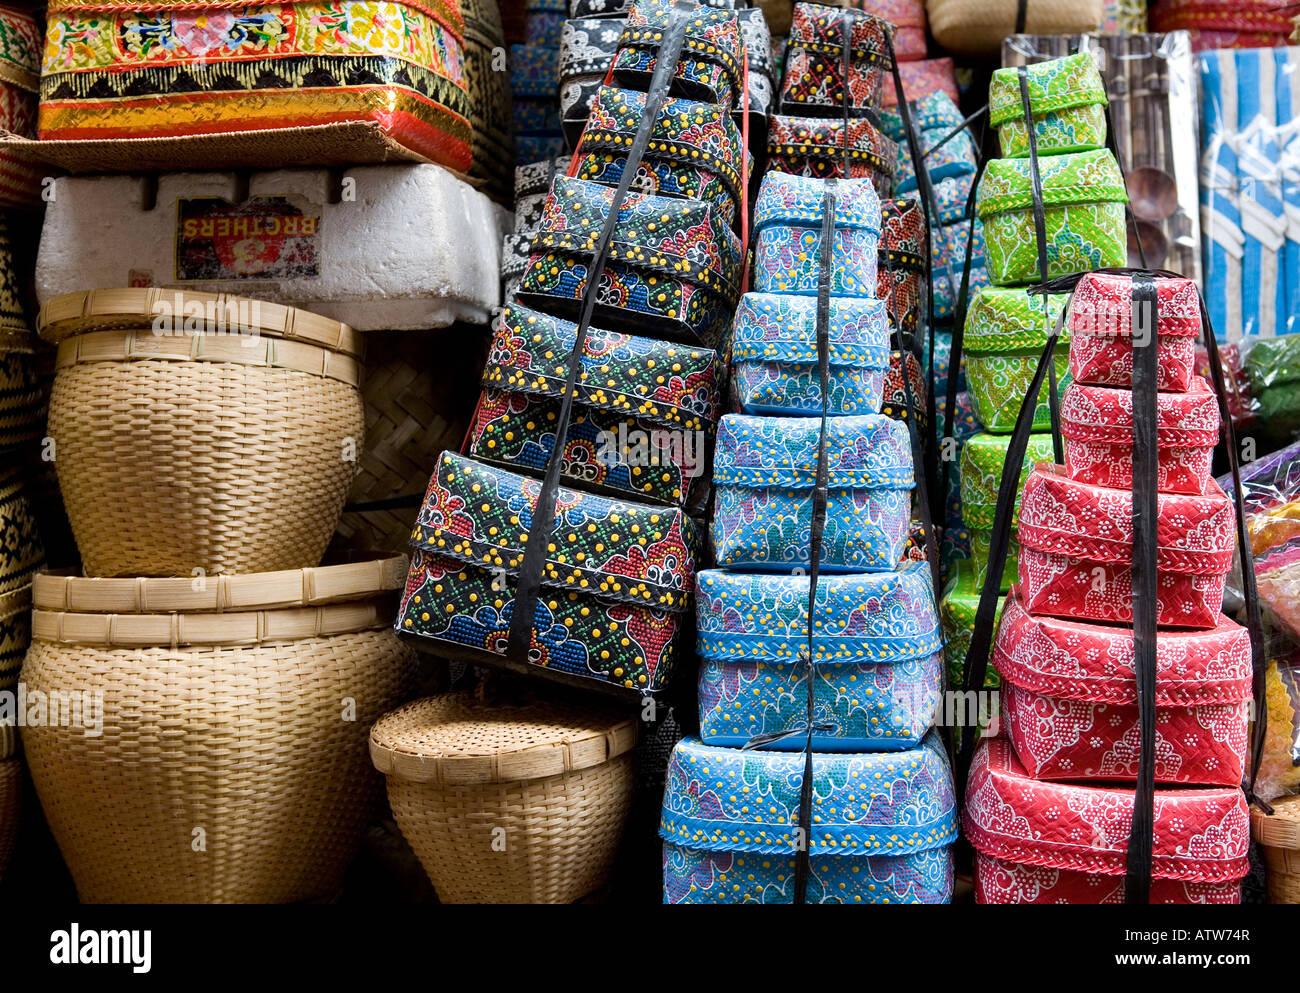 Street Market Ubud Bali Indonesia - Stock Image